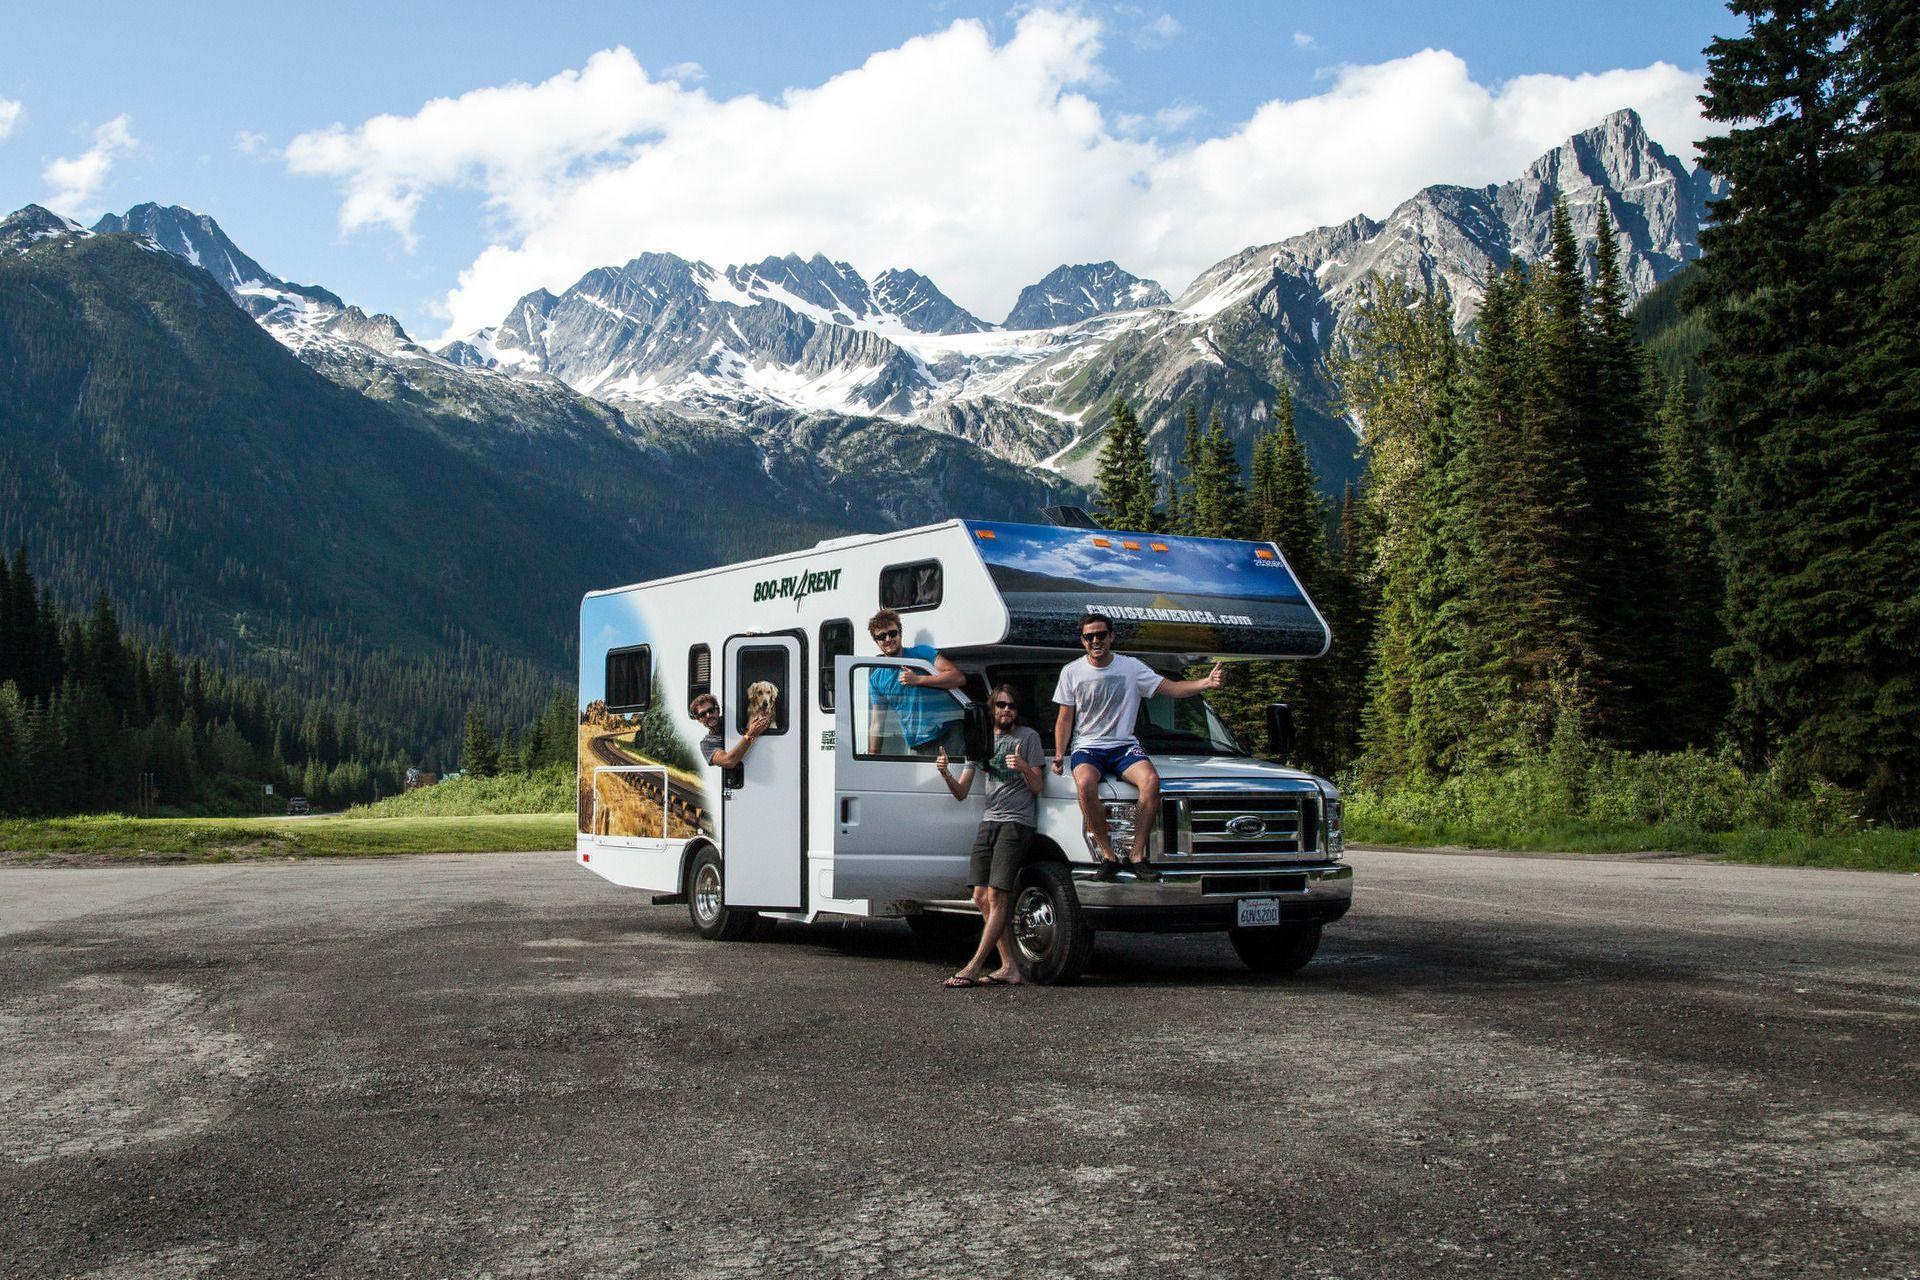 Standard Rv Rental Rv Rental Touring Caravan Recreational Vehicles